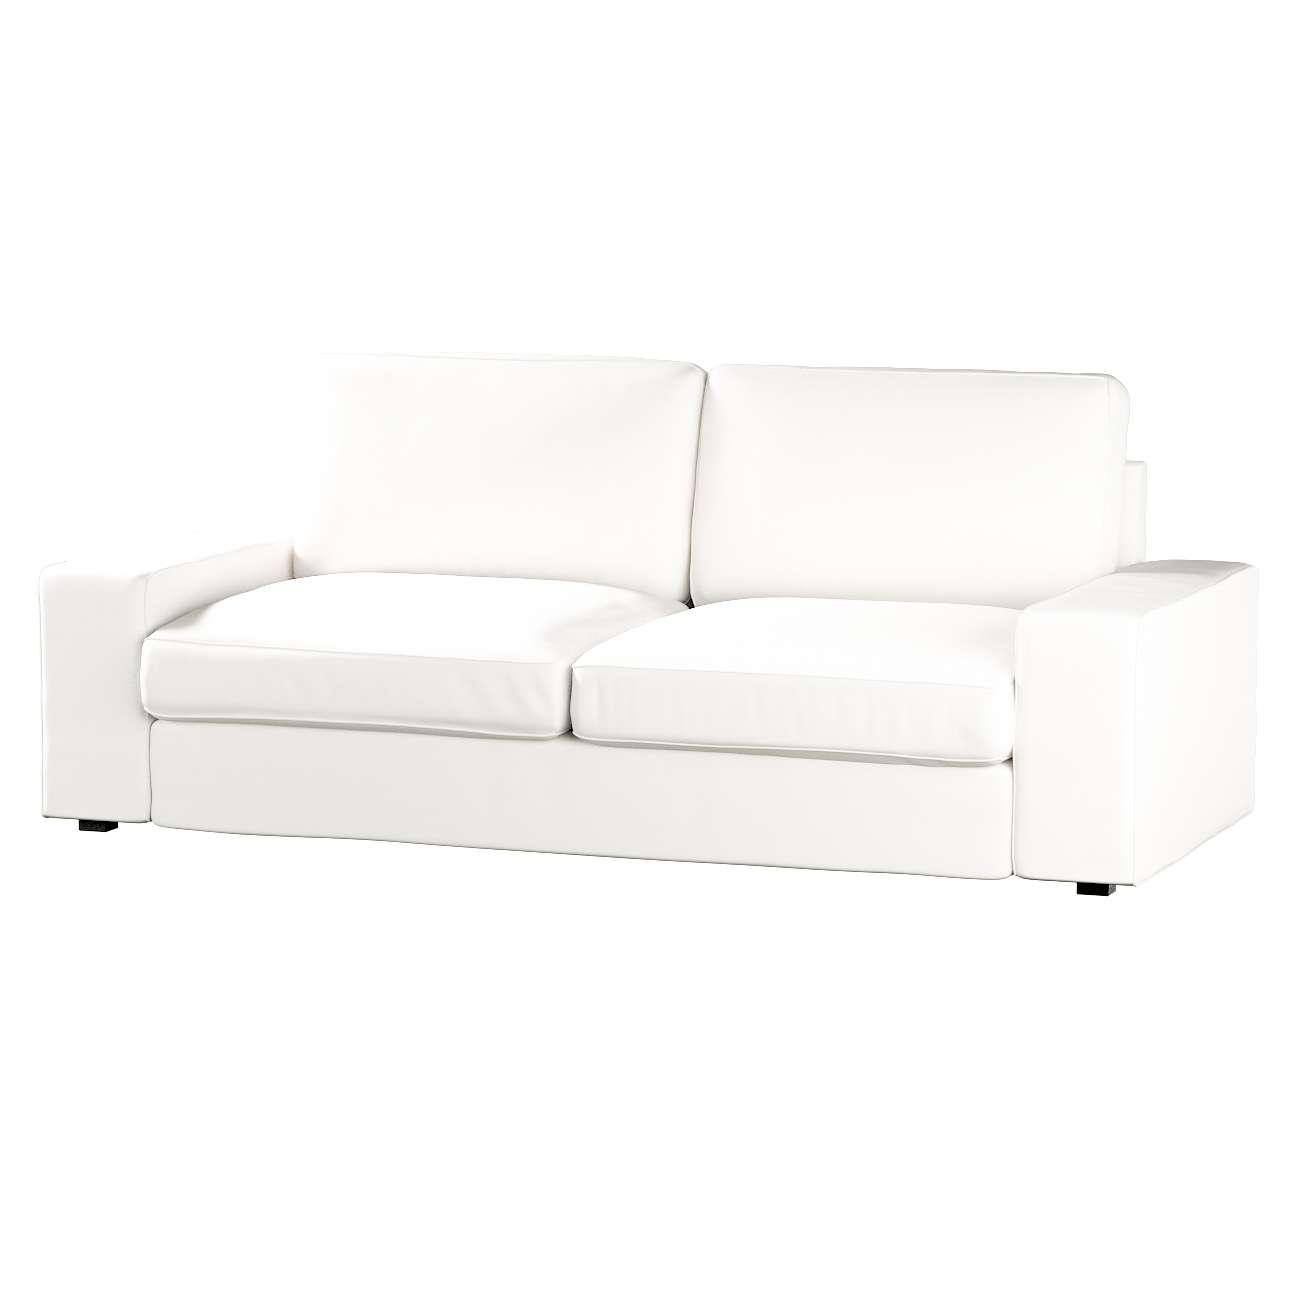 Kivik 3-Sitzer Sofabezug Sofa Kivik 3-Sitzer von der Kollektion Cotton Panama, Stoff: 702-34